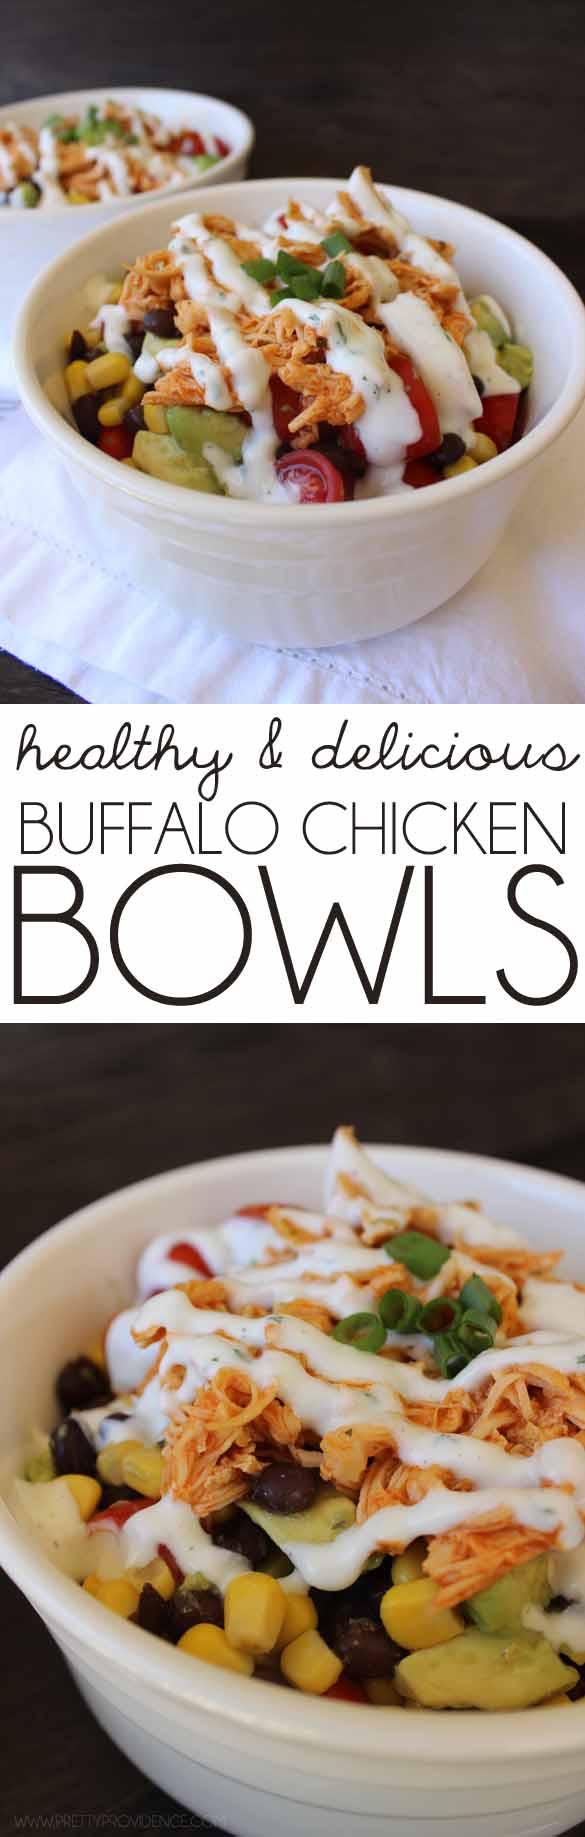 Buffalo Chicken Recipes Healthy  Healthy Buffalo Chicken Bowls Recipes for Diabetes